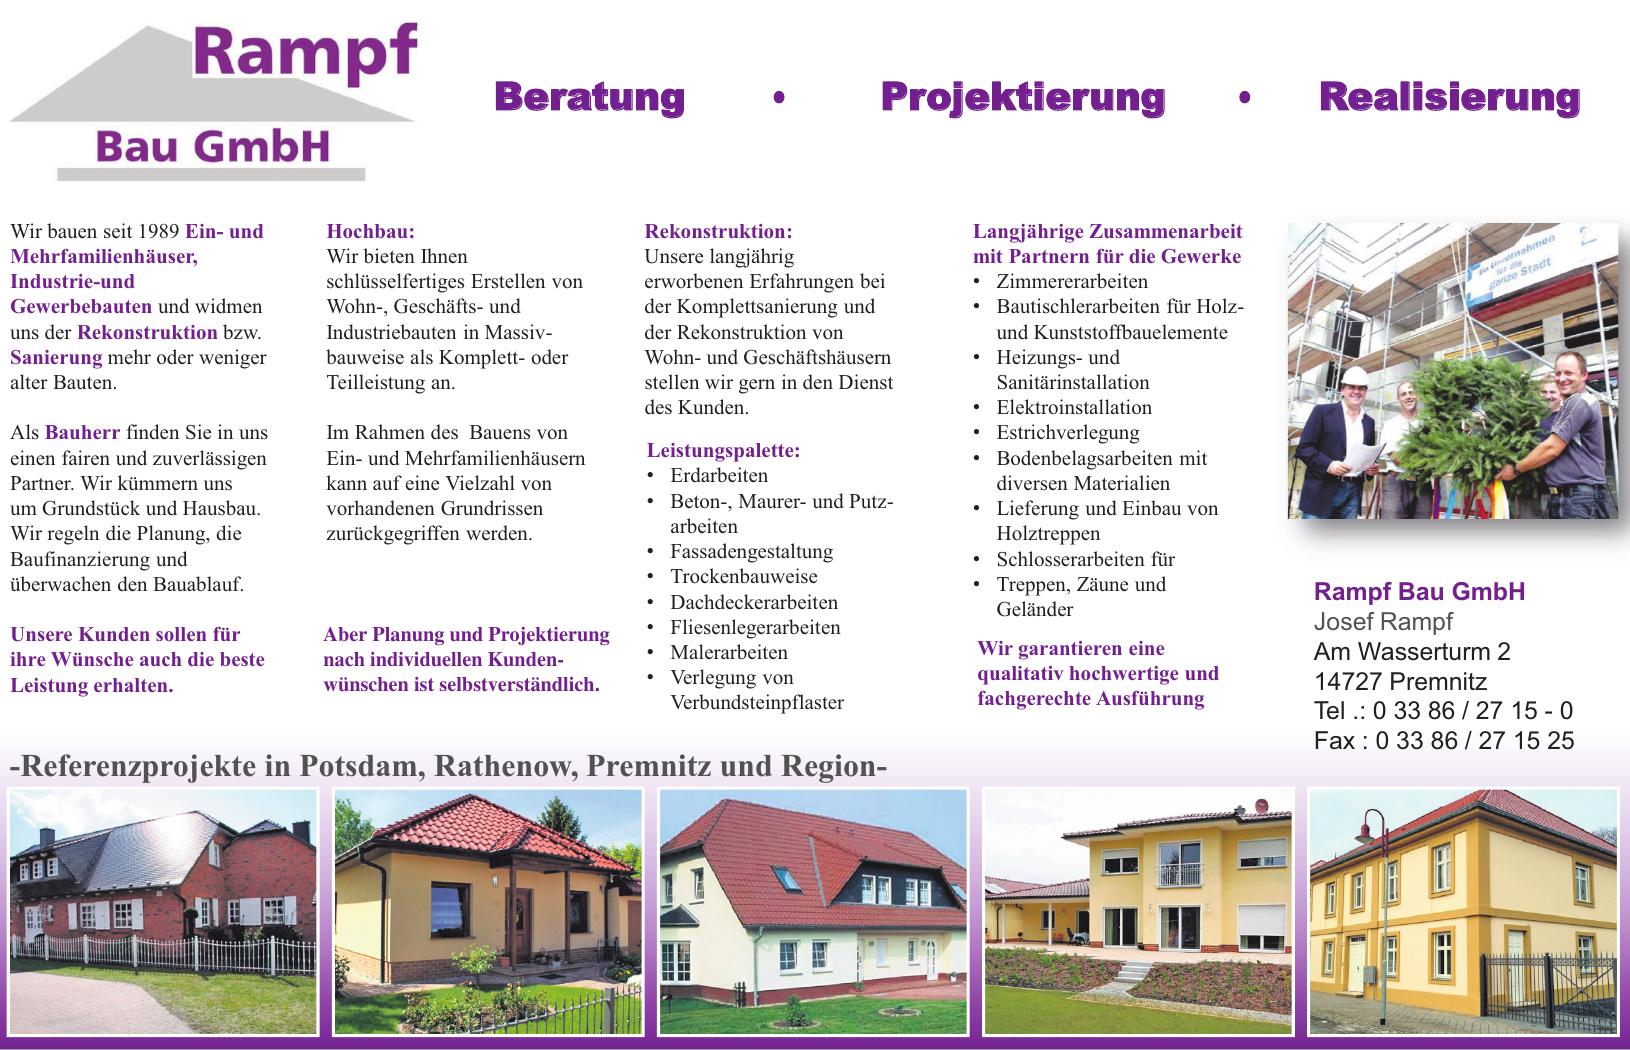 Rampf Bau GmbH